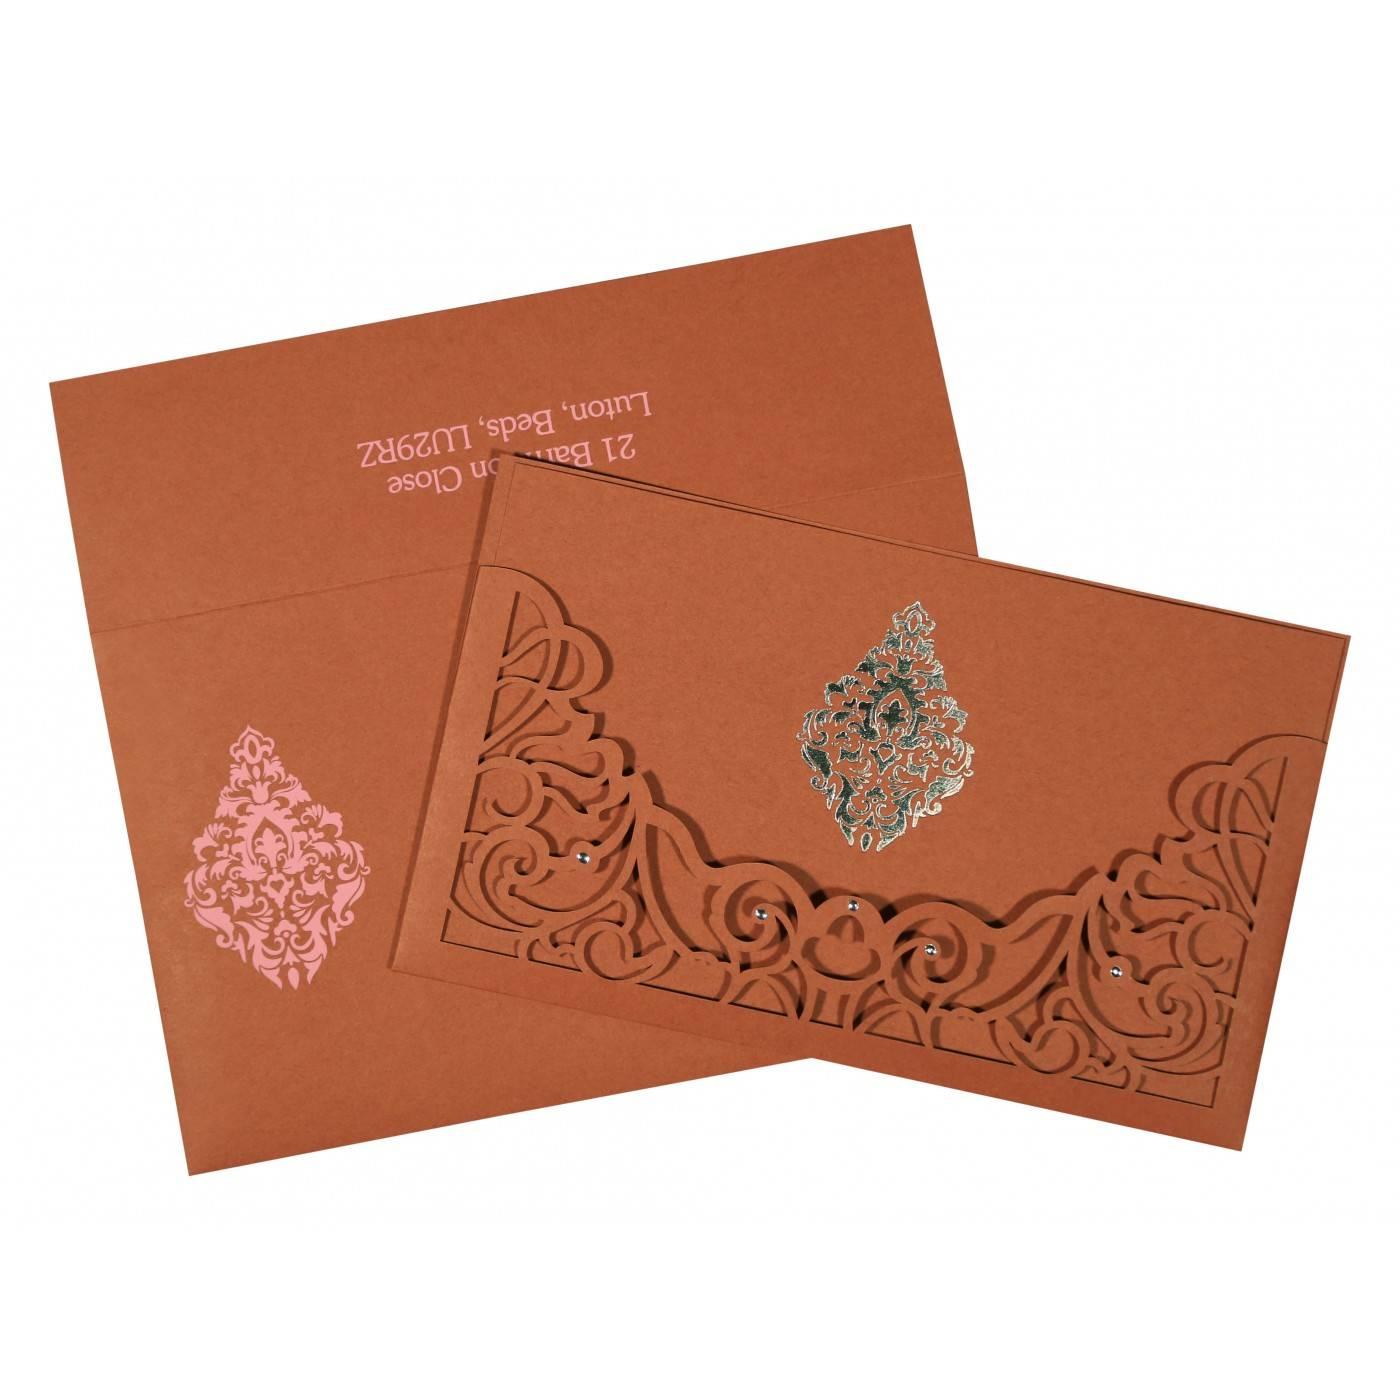 BRICK RED MATTE DAMASK THEMED - LASER CUT WEDDING CARD : CW-8262F - IndianWeddingCards